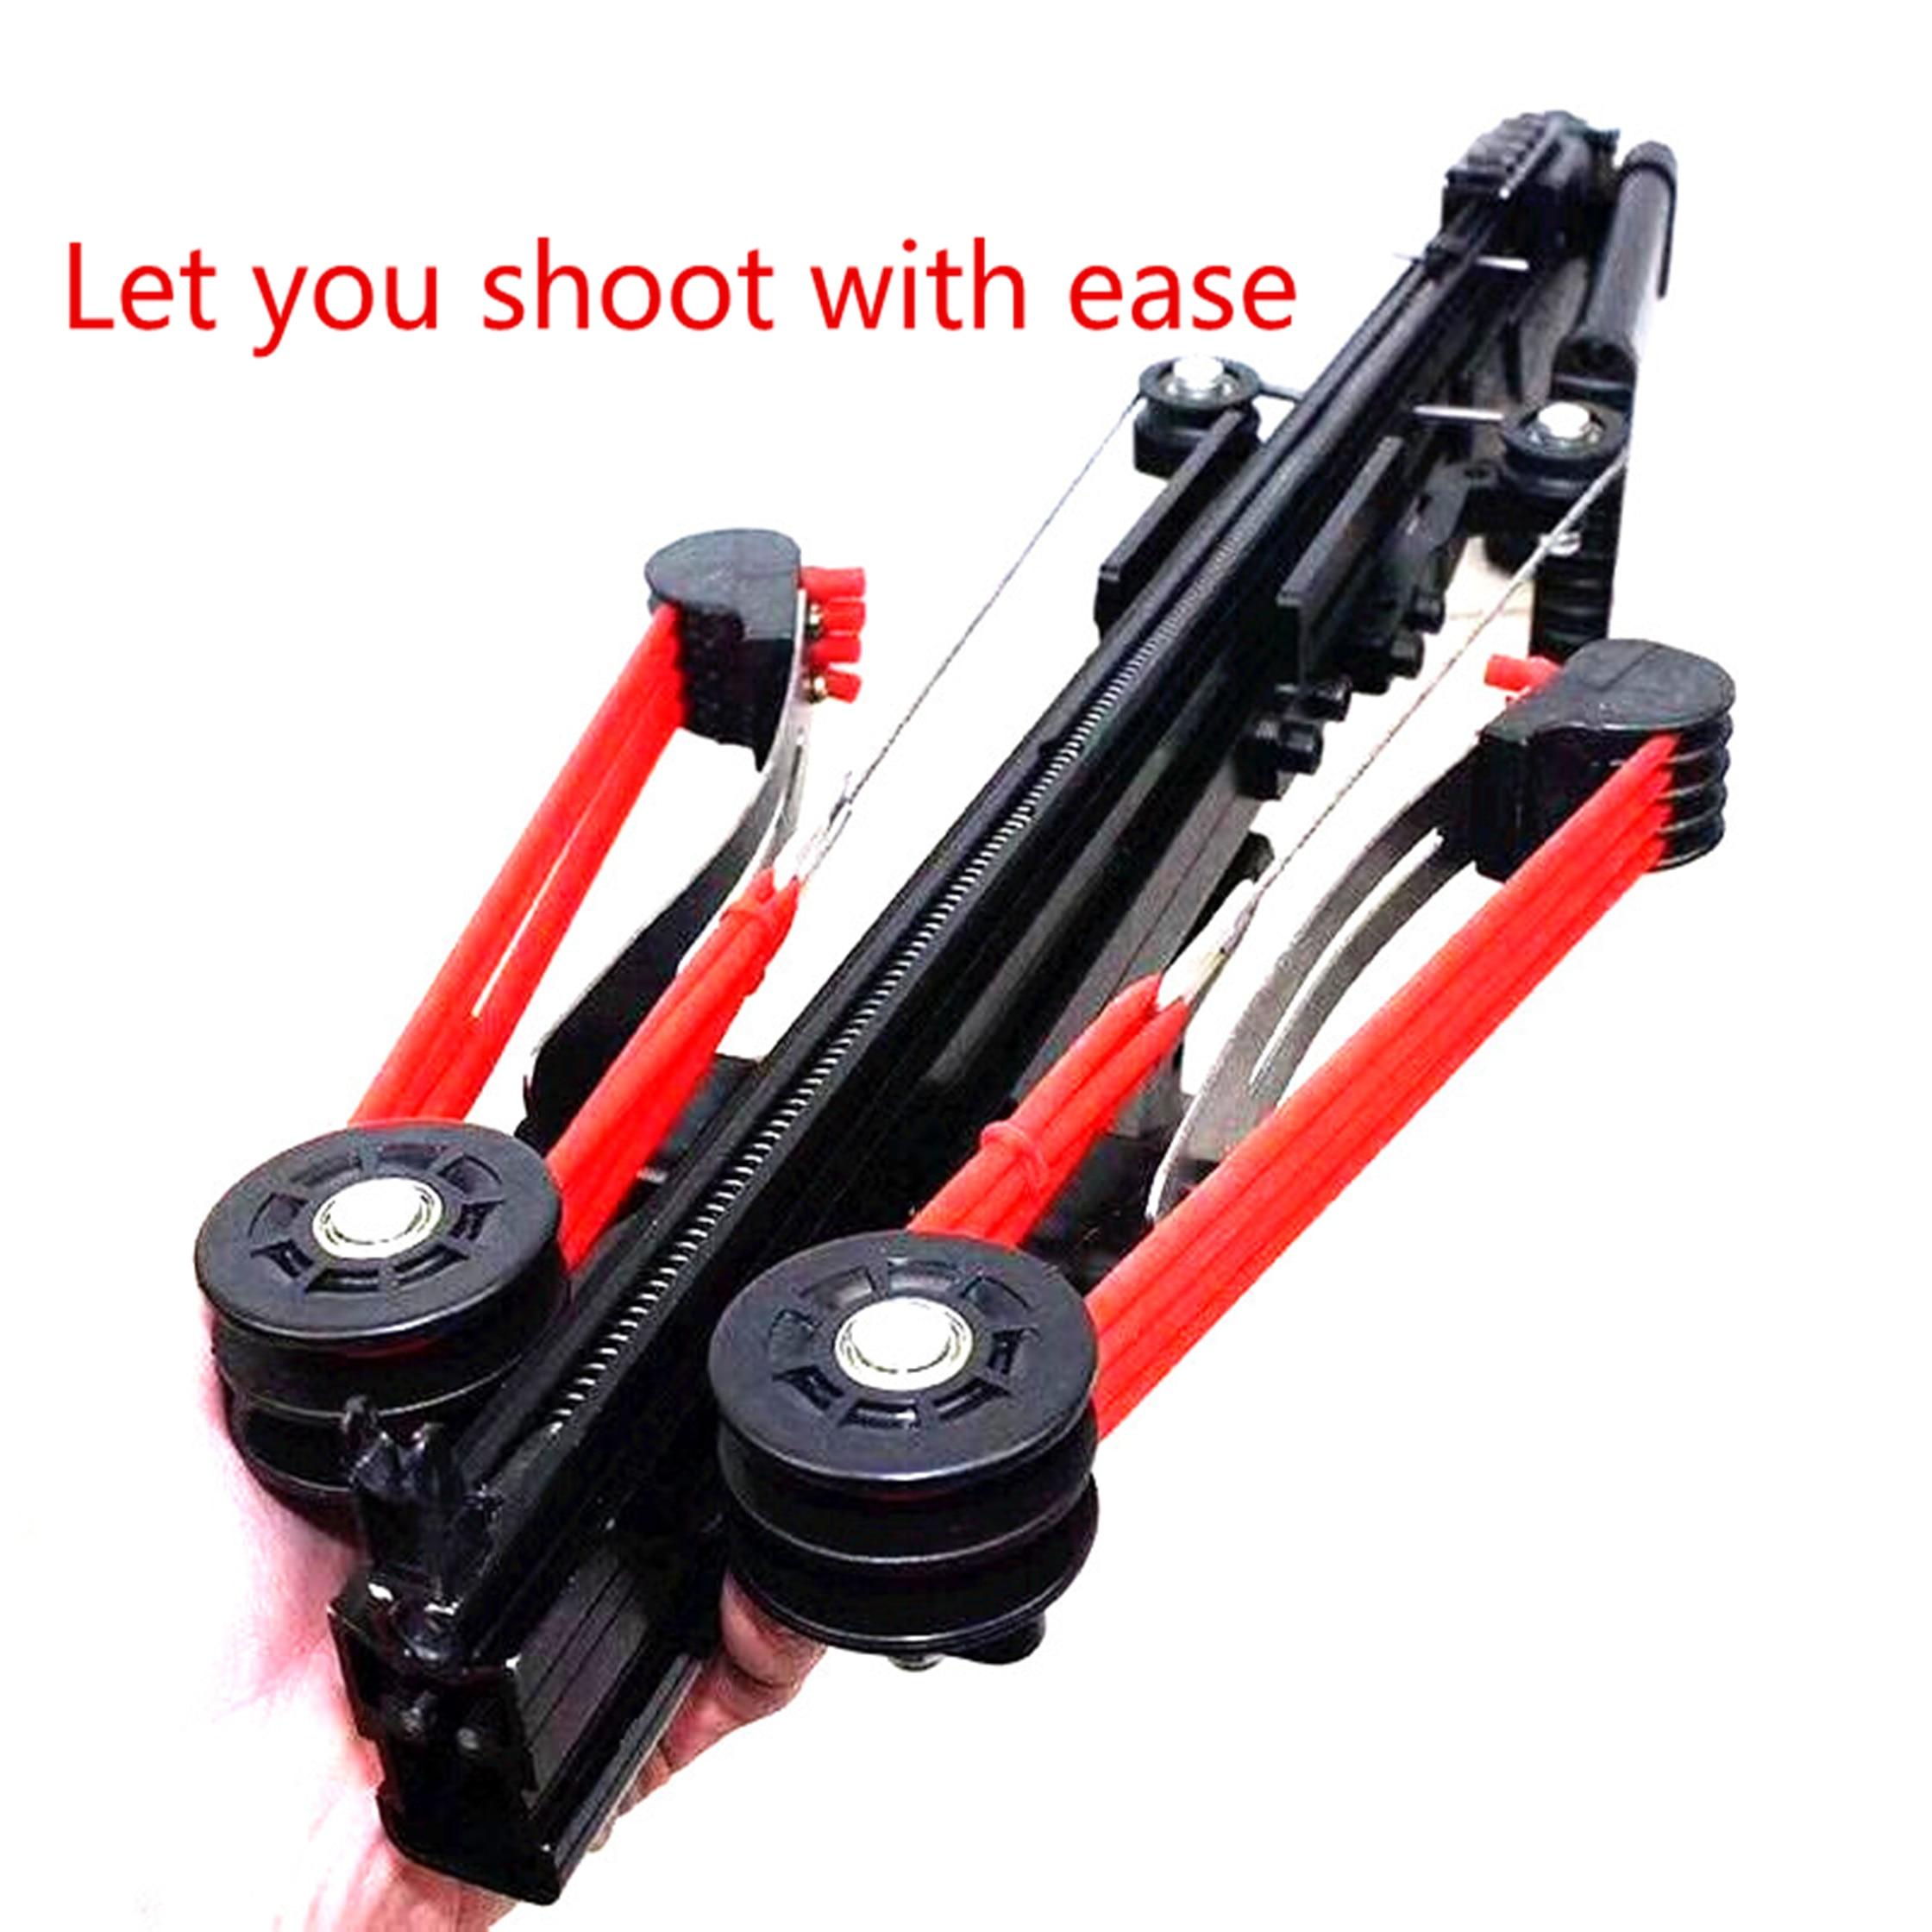 Neptune 11 Slingshot 40BB Shooting Tension Rubber Band Bullets Hunting Slingshot Semi-automatic slingshot Continuous shooting